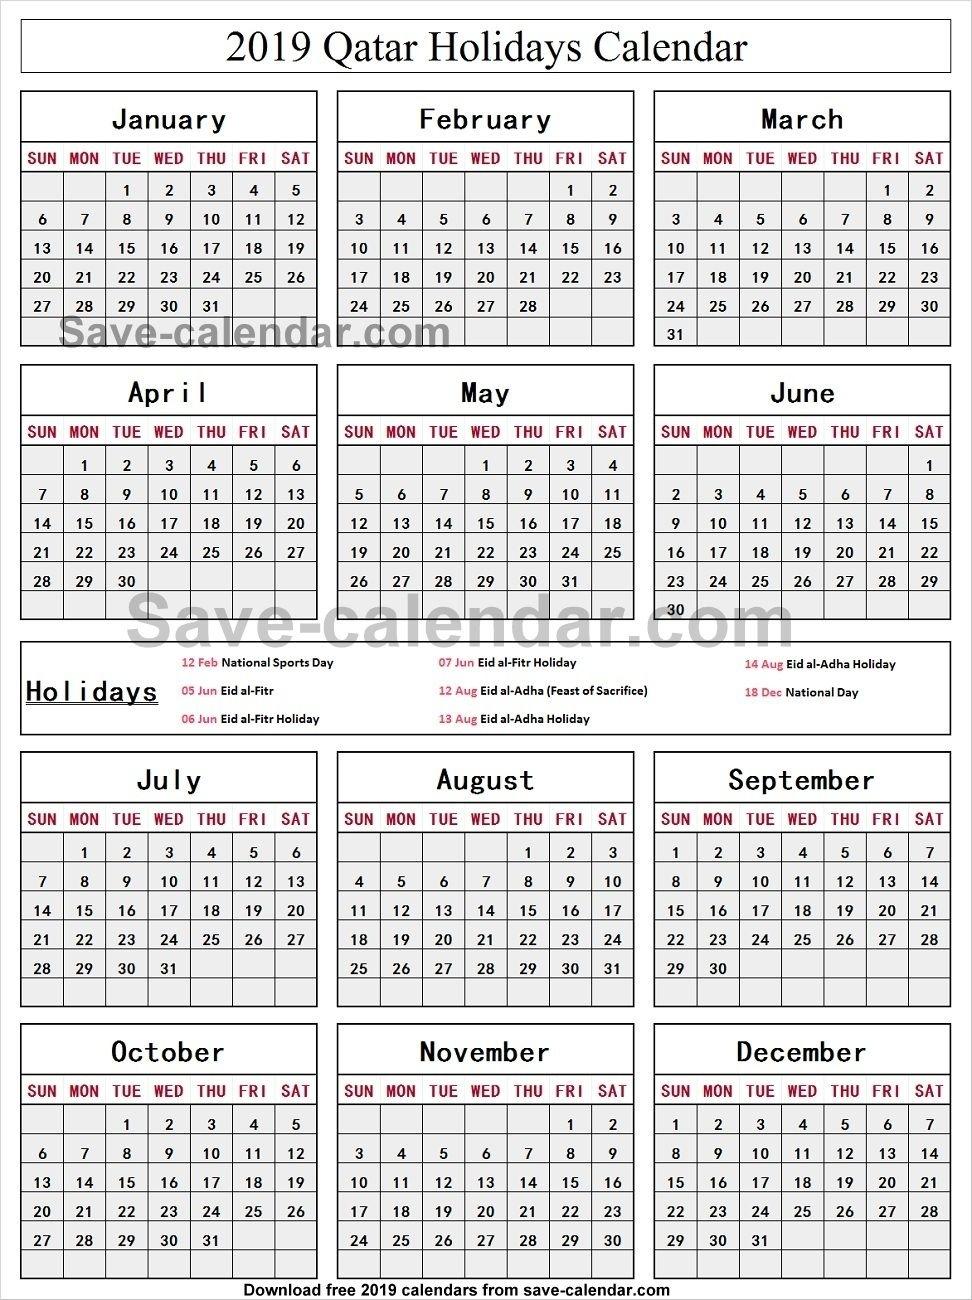 Calendar 2019 Holidays Qatar • Printable Blank Calendar Template regarding School Year Calendar 2019-2020 Michael E. Debakey High